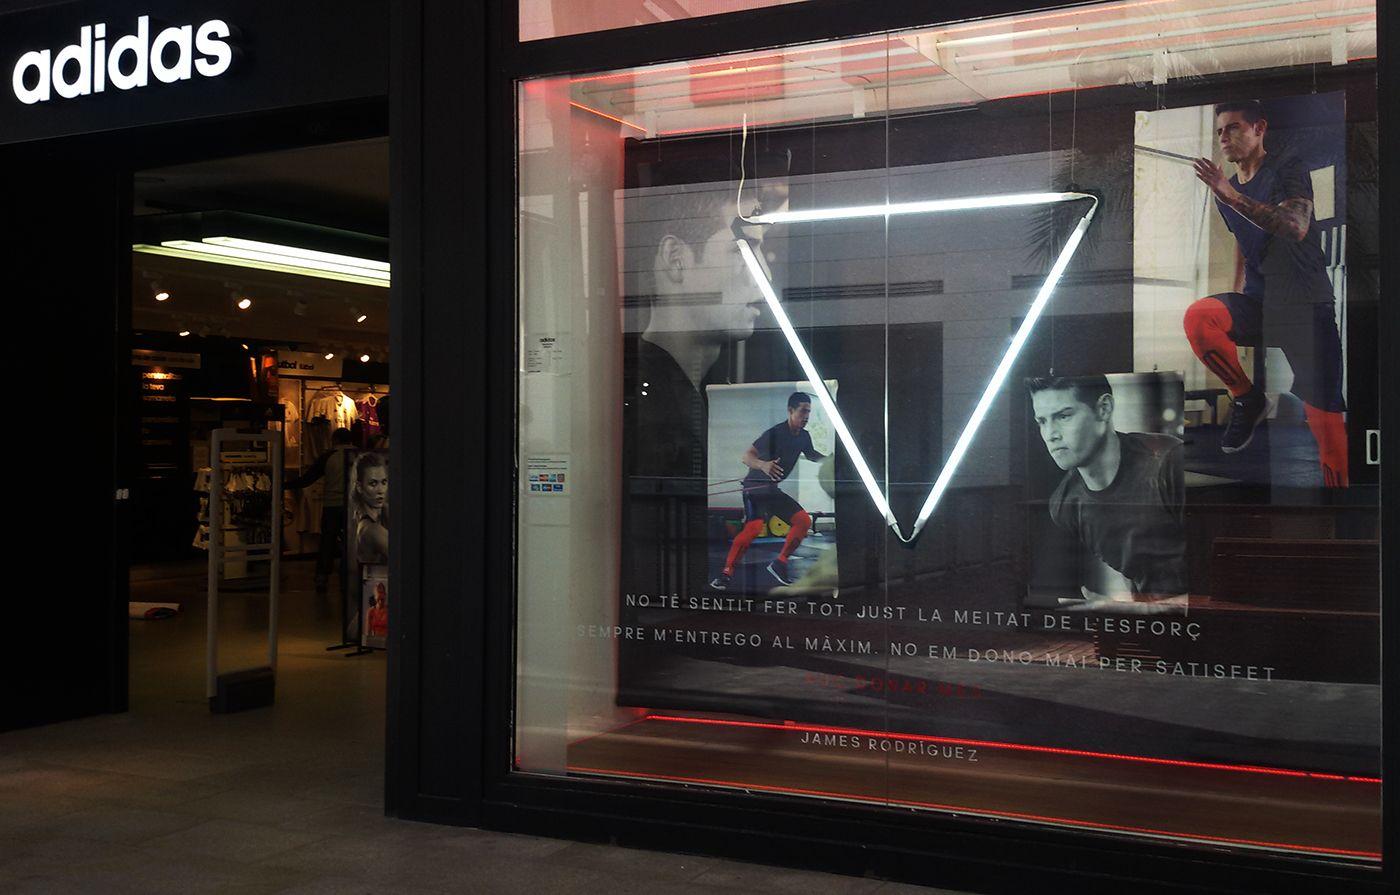 Ocho Isla de Alcatraz hoy  Escaparates Adidas Athletics en Adidas Store Maquinista on Behance | Street  style women, Street style paris, Fashion design